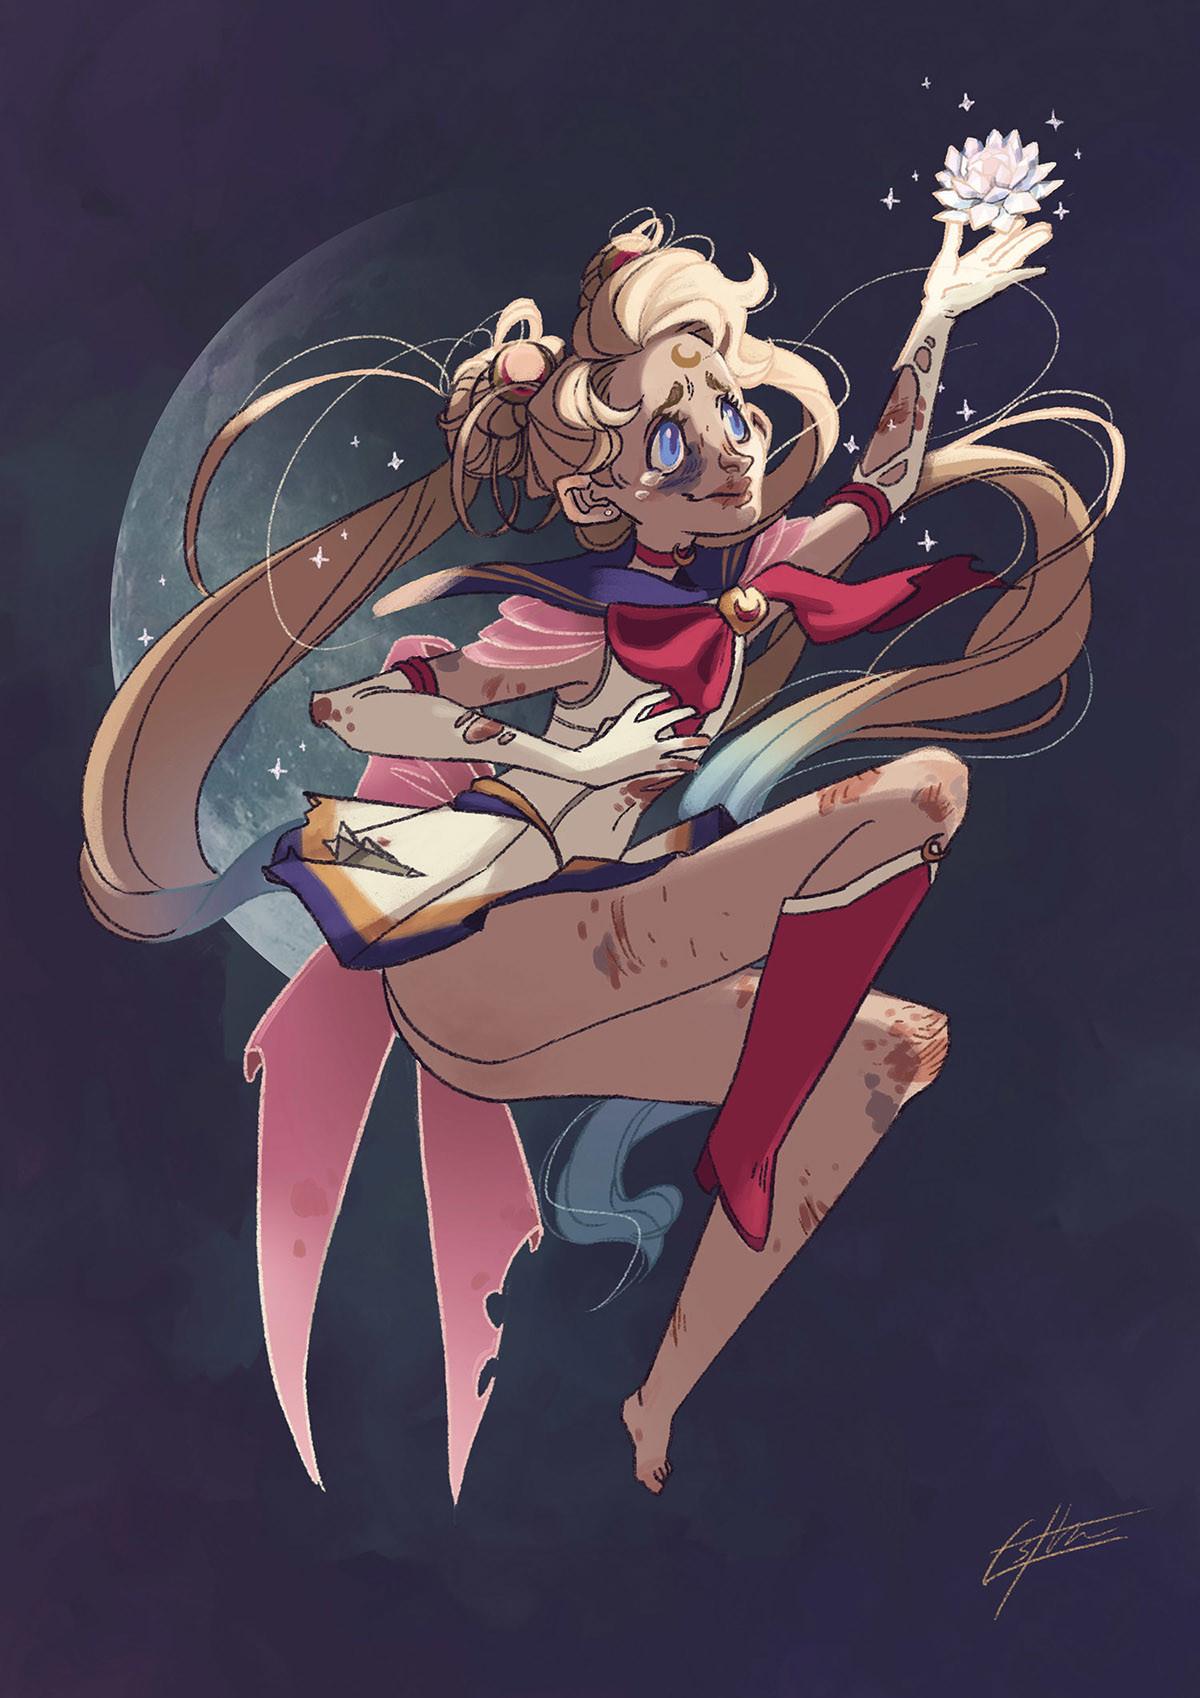 Character Design Challenge Sailor Moon : Esther vidal character design challenge sailor moon and